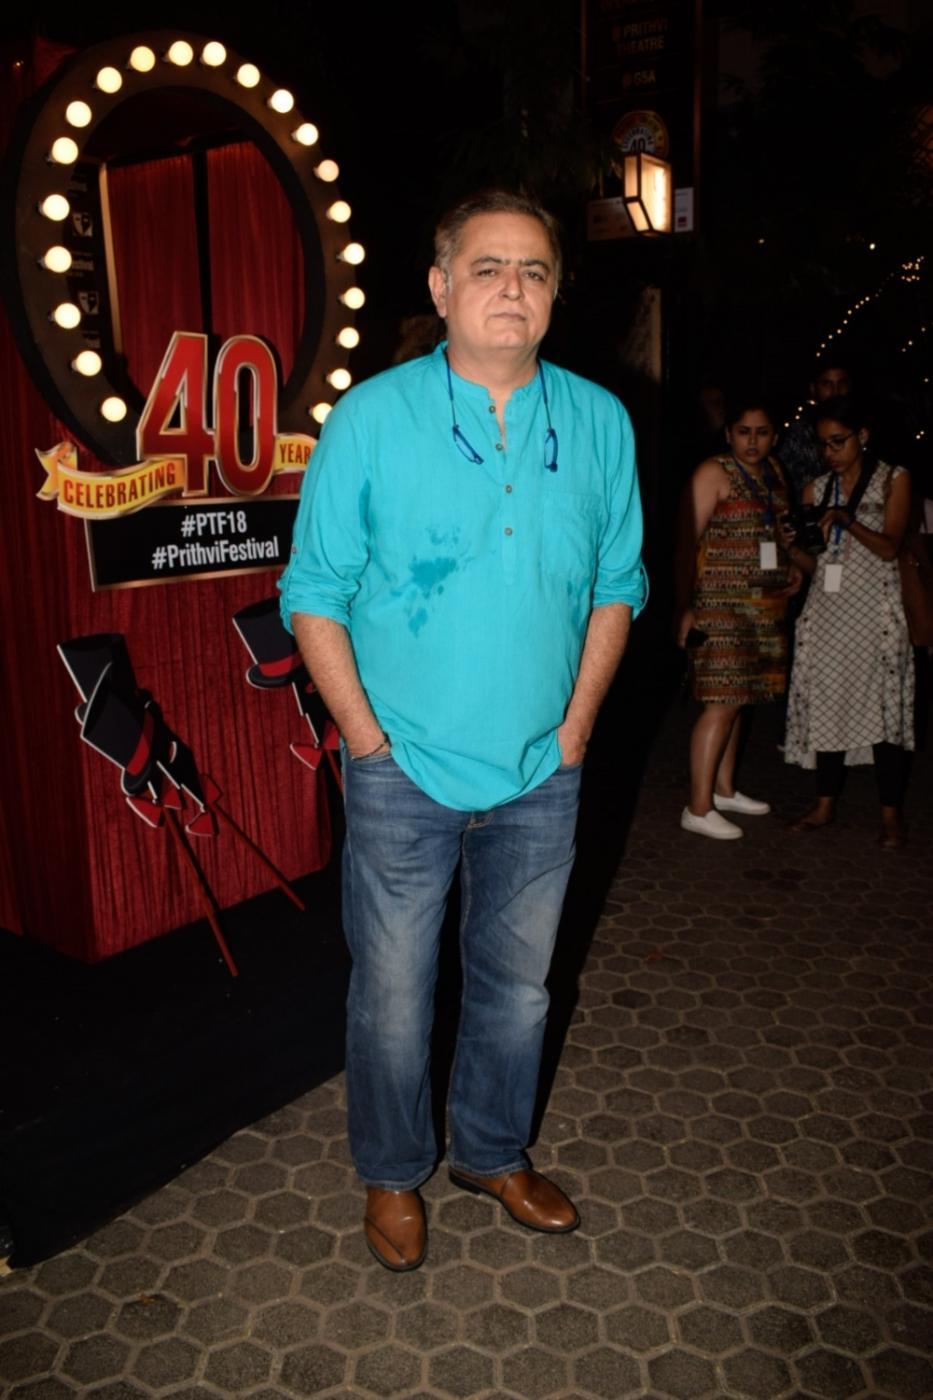 Mumbai: Filmmaker Imtiaz Ali at the 40th anniversary celebration of the Prithvi Theatre in Mumbai on Nov 5, 2018. (Photo: IANS) by .